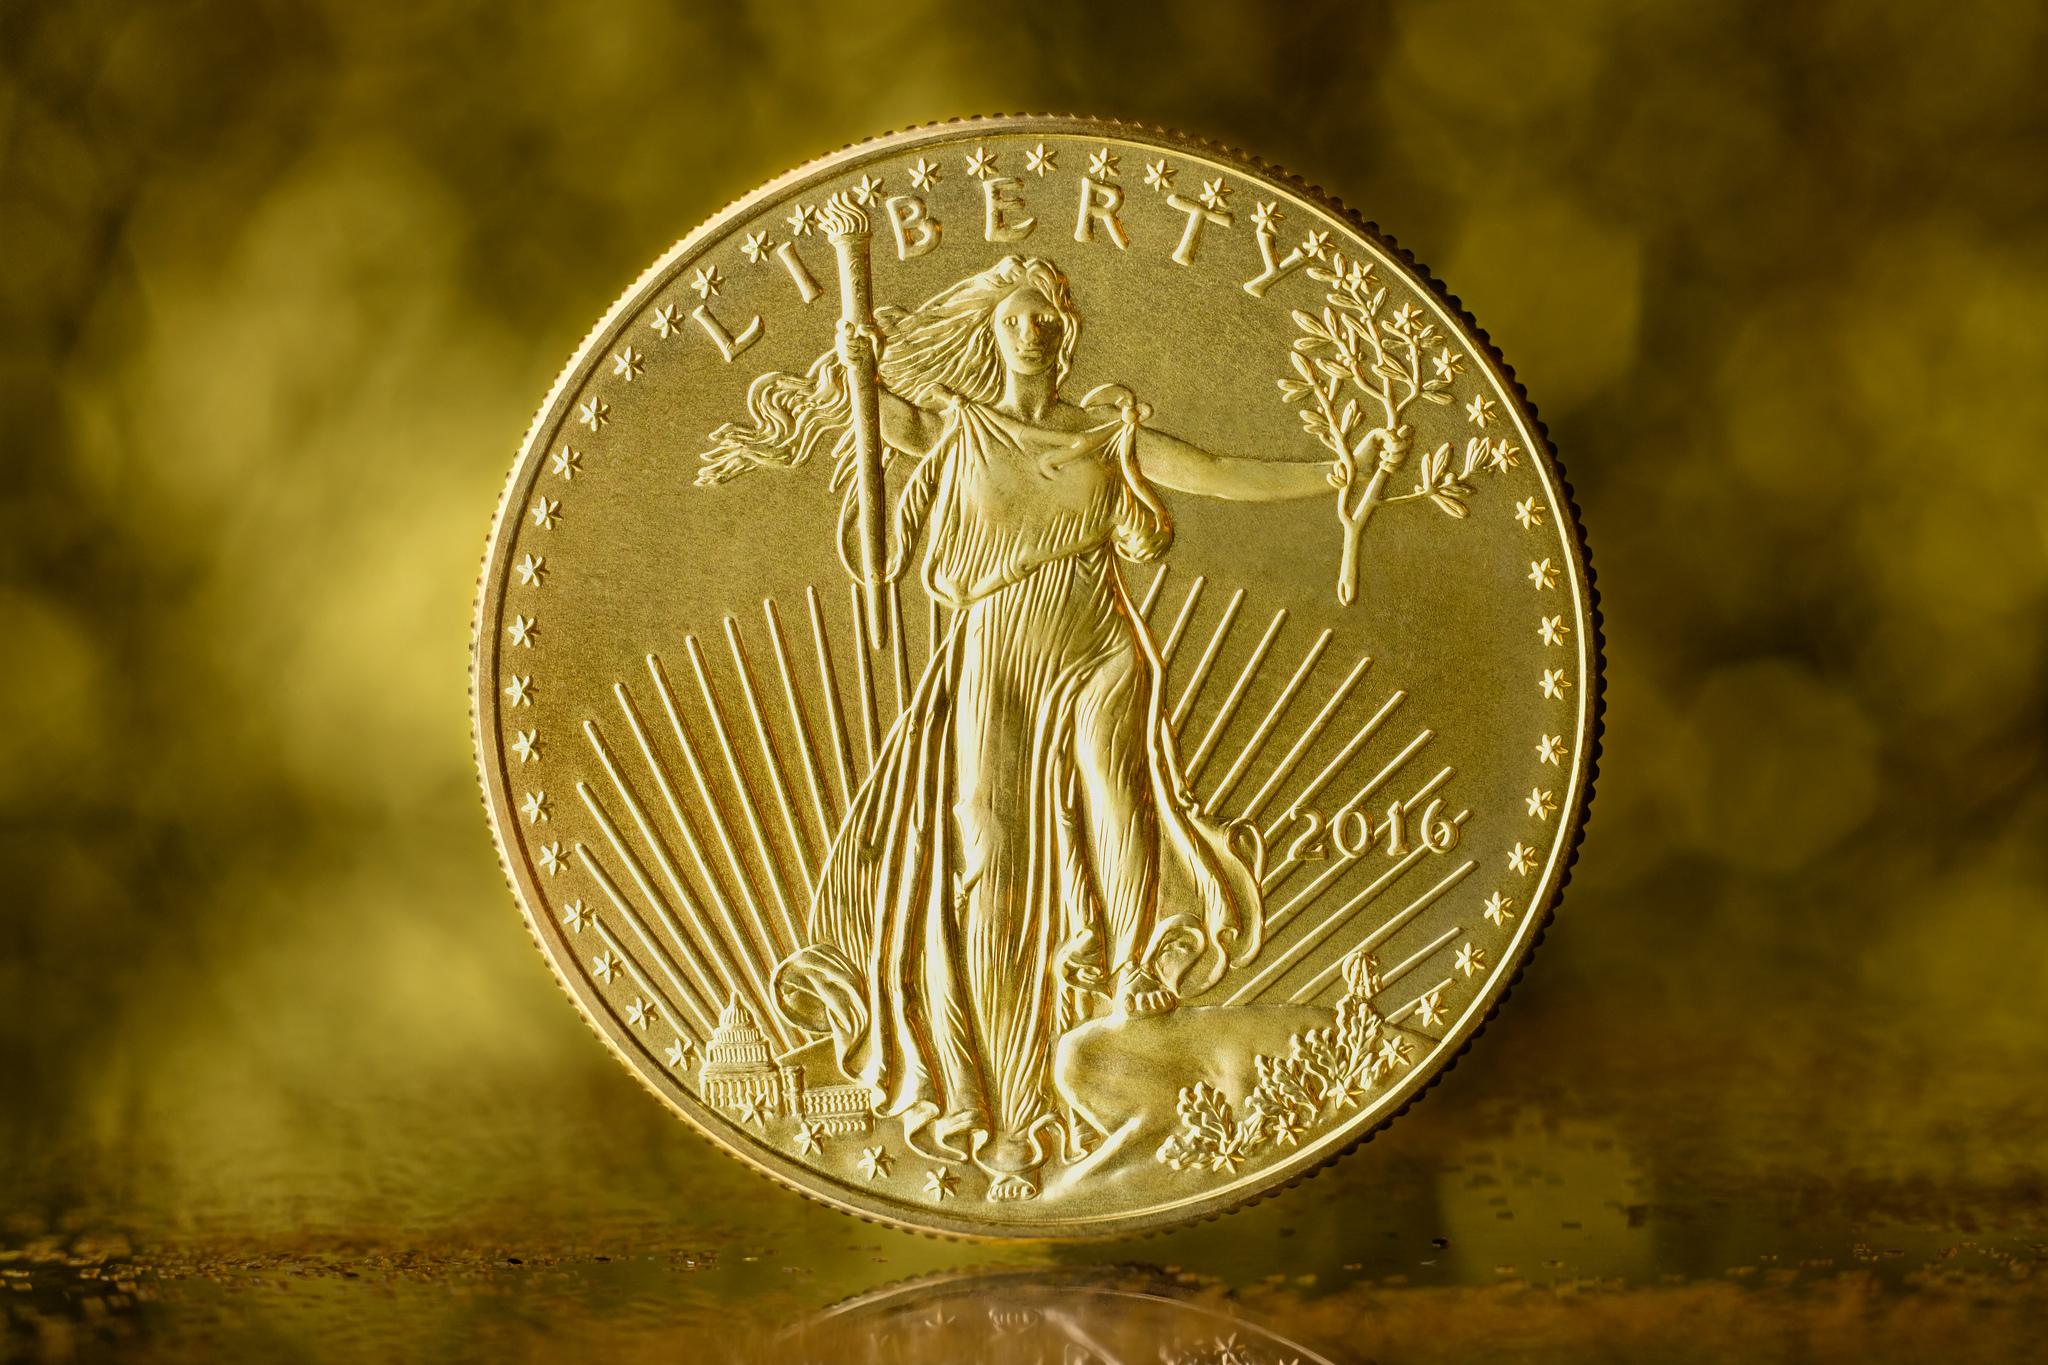 verkopen gouden munten